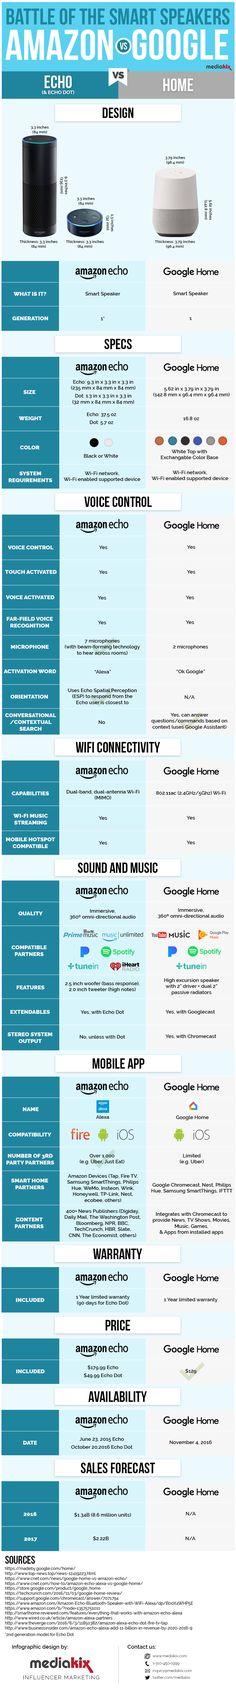 Google Home vs Amazon Echo Dot Smart Speaker Infographic Comparison